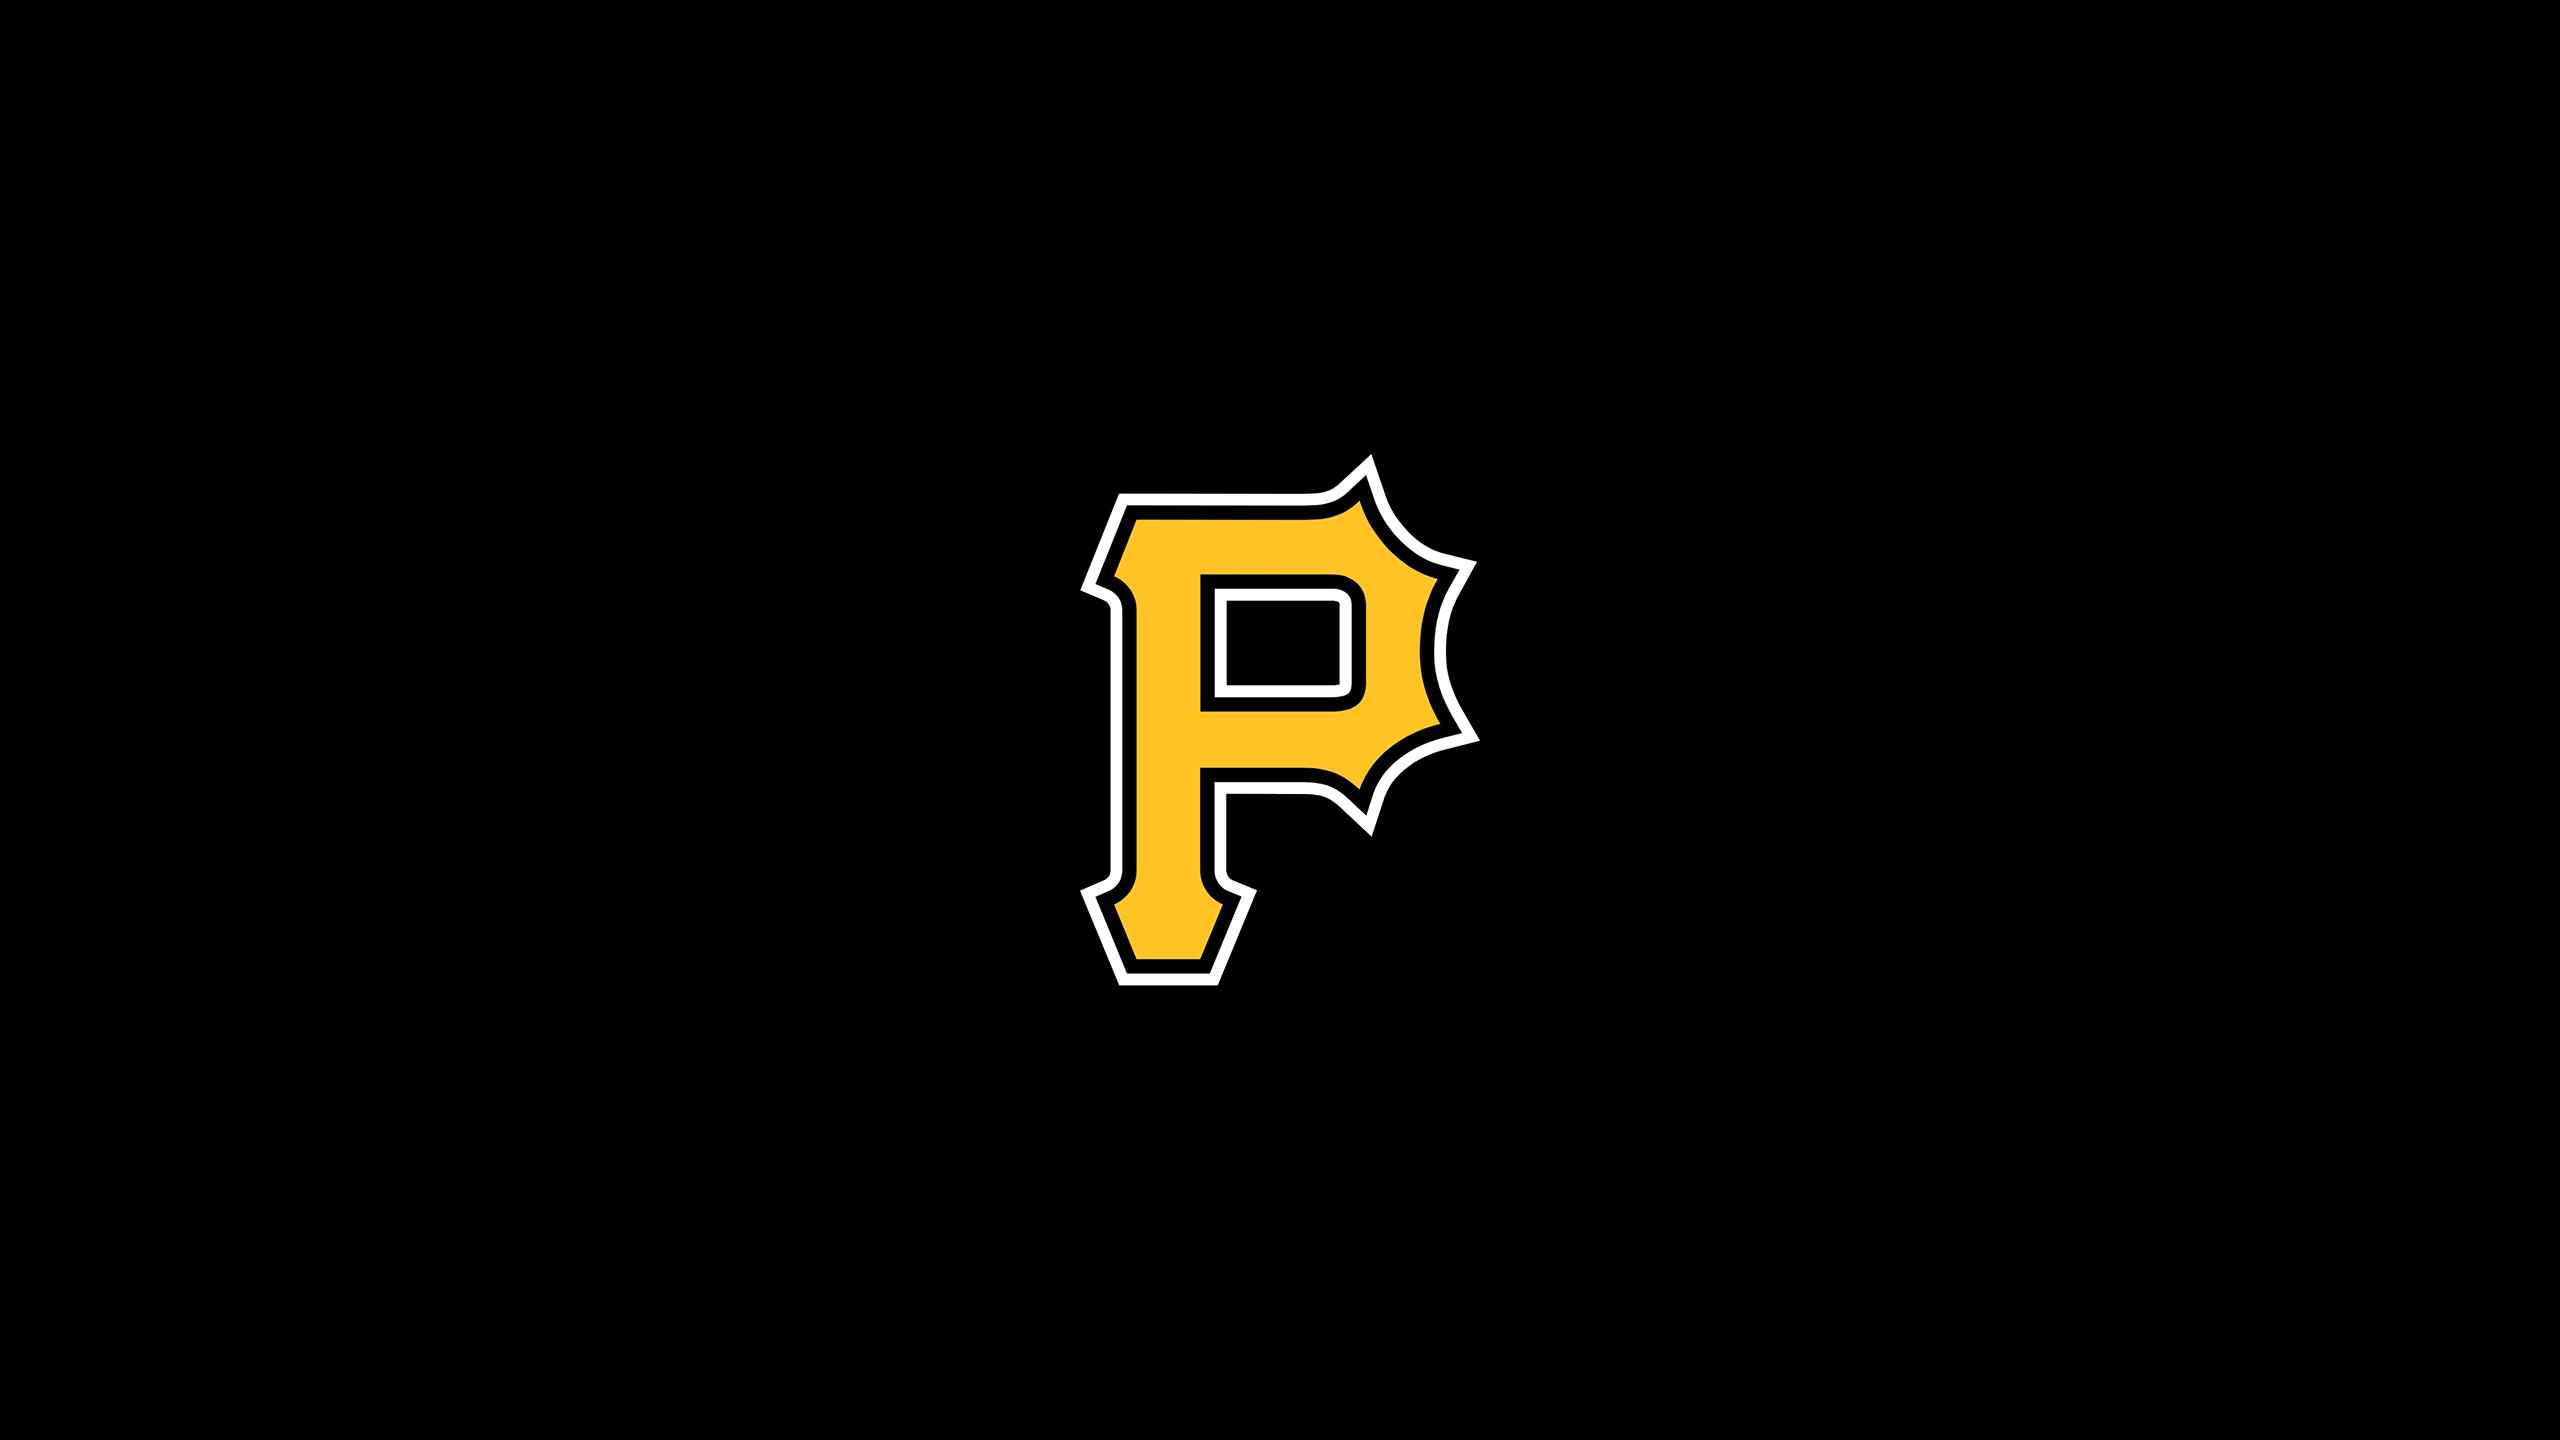 Pittsburgh Pirates (Alt Uniform)